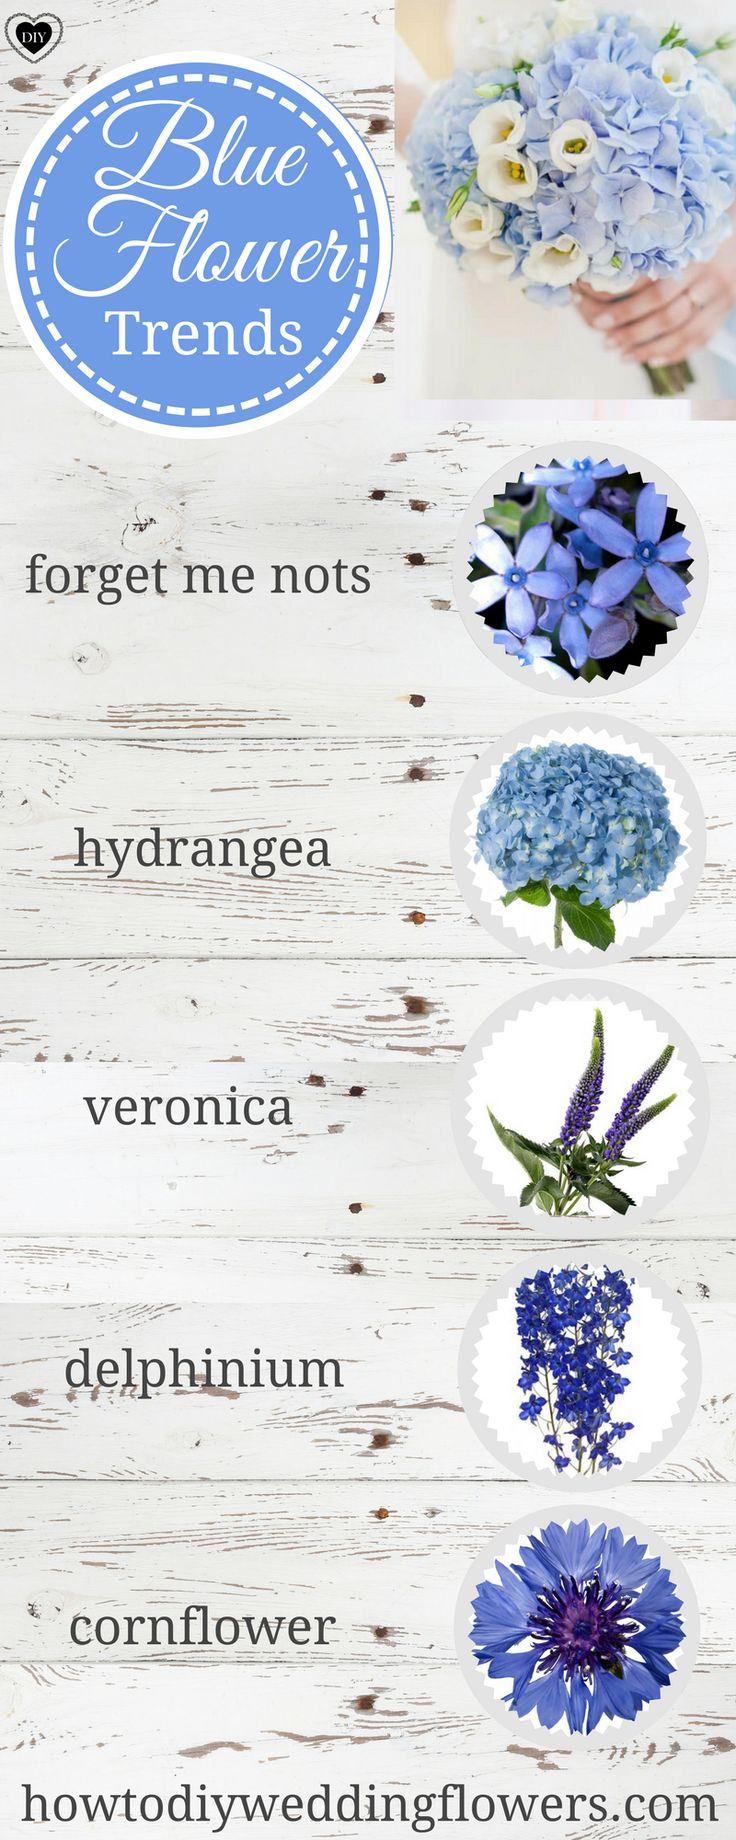 587 best flowers foliage images on pinterest flower arrangements blue wedding trends blue bouquet flowers bouquets weddings ideas how to make a bouquet diy wedding izmirmasajfo